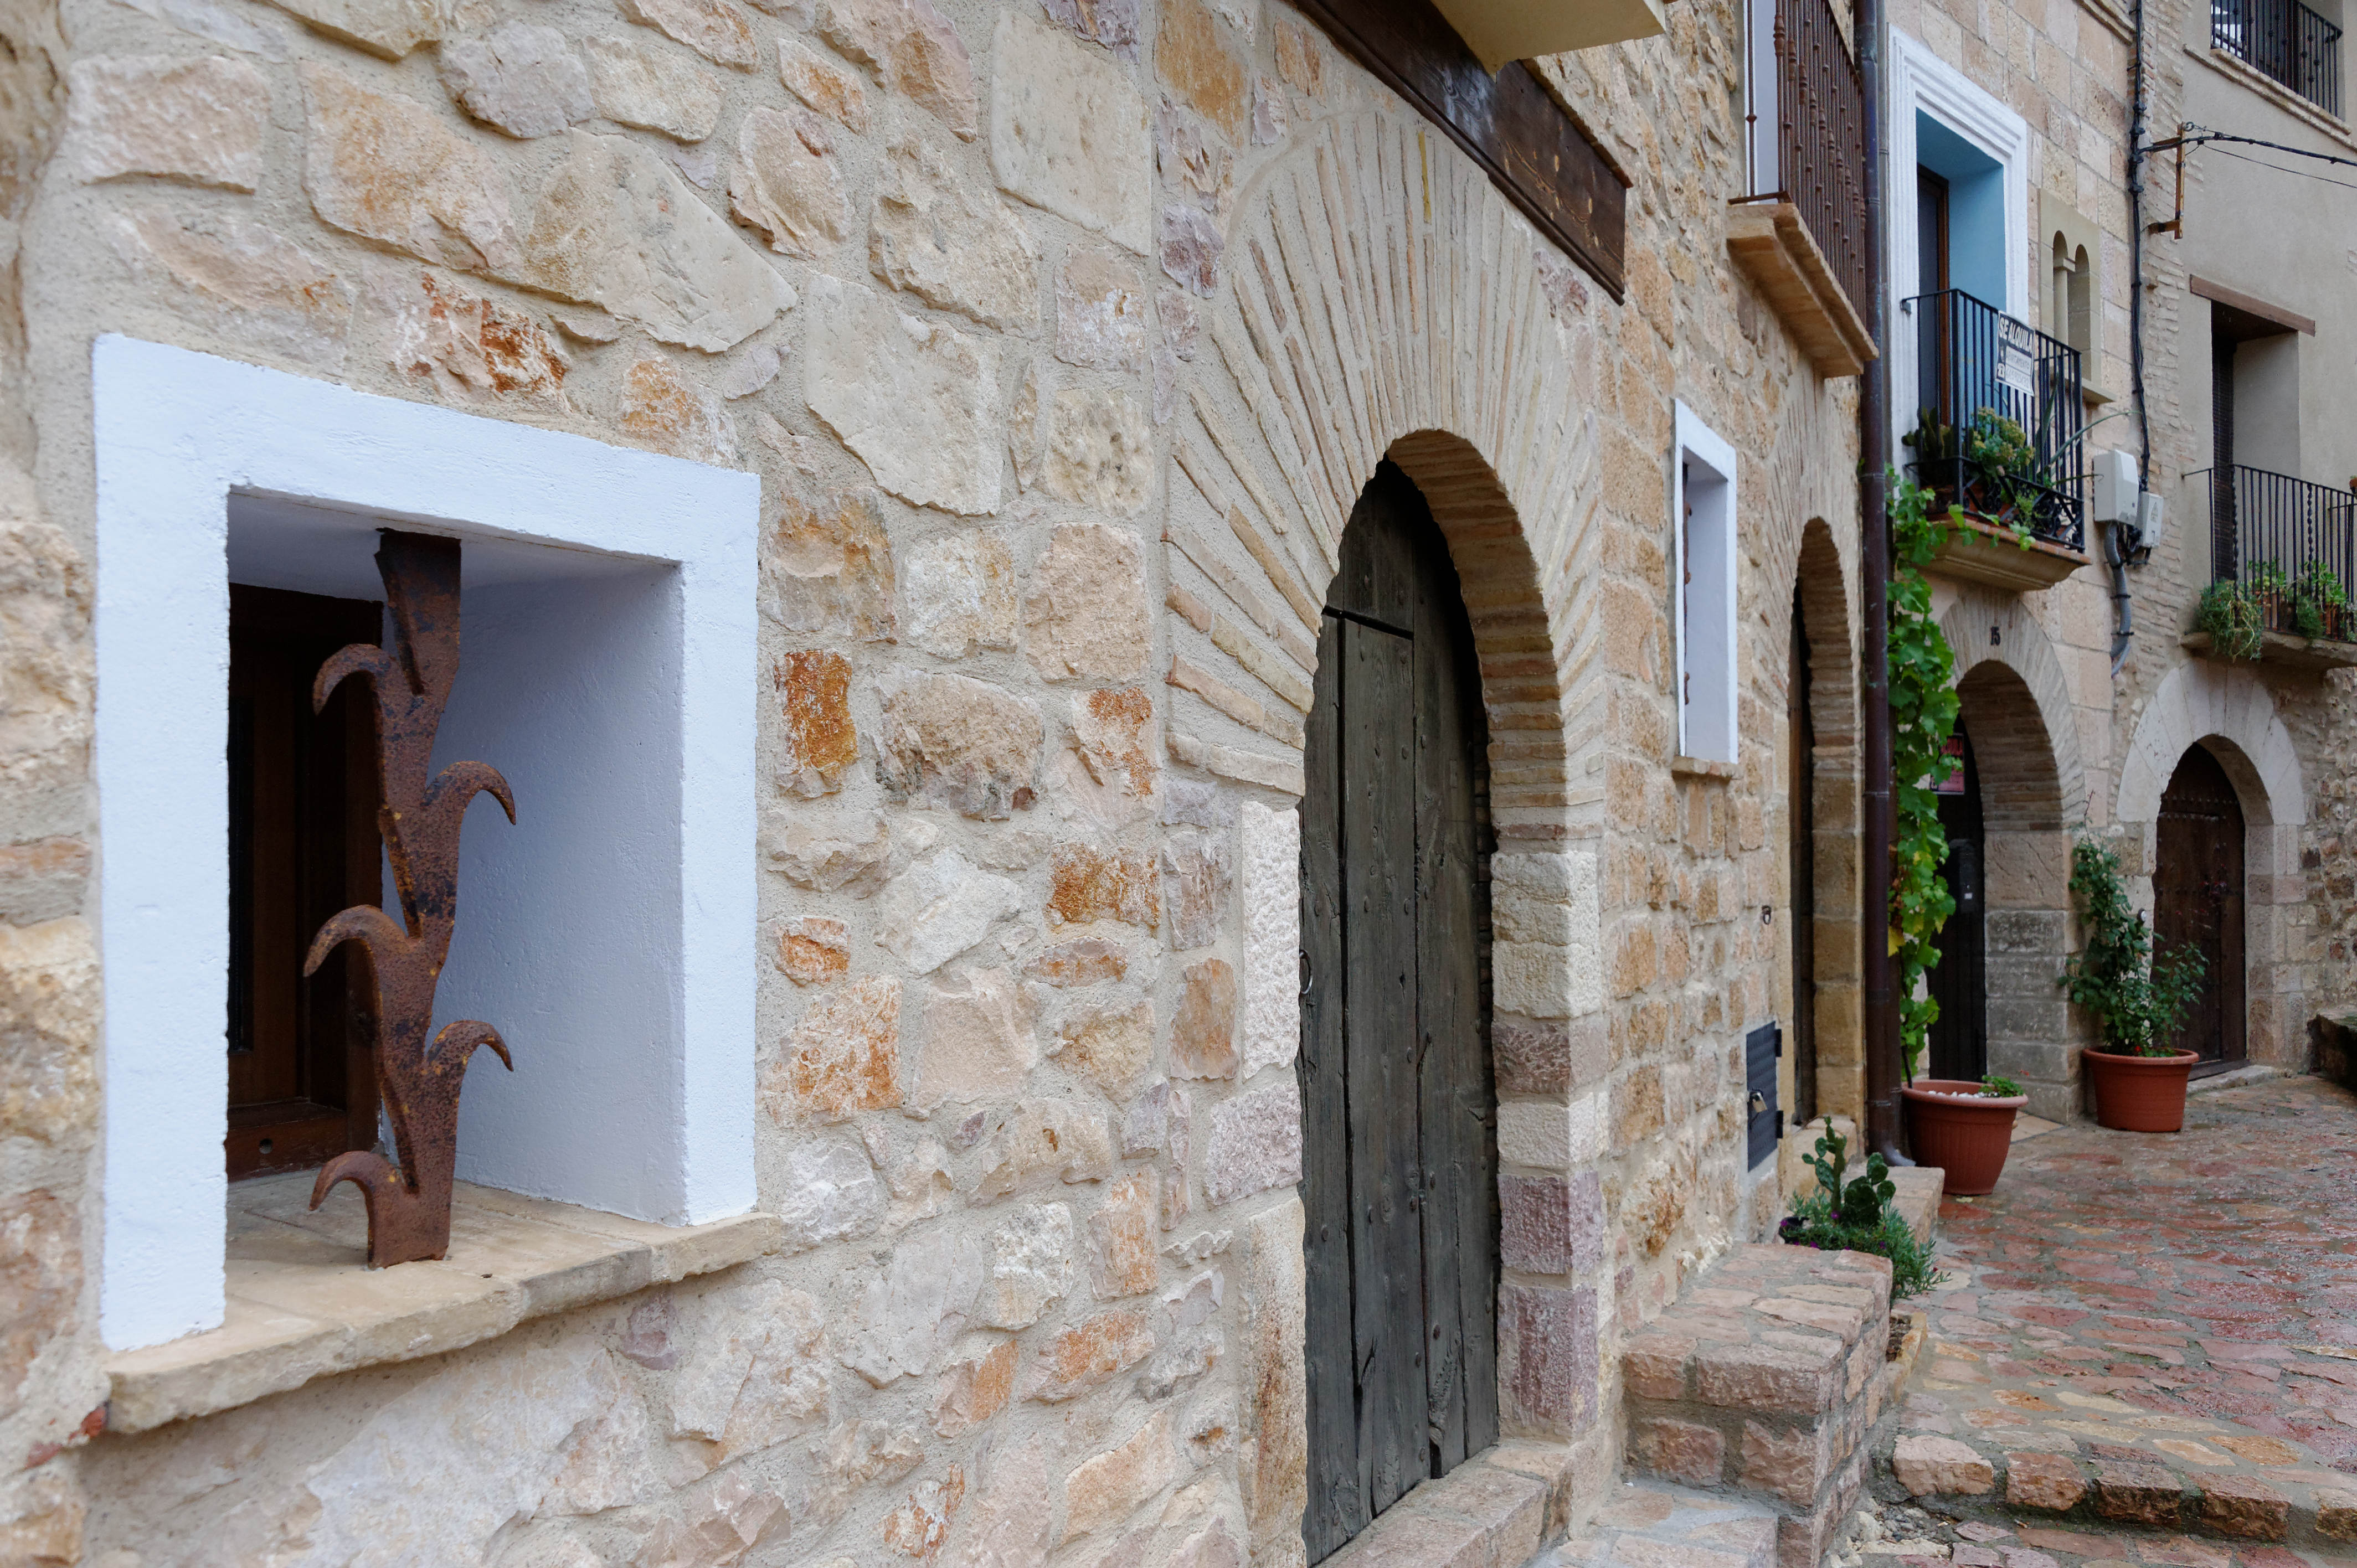 4284_Alquezar (Aragon)